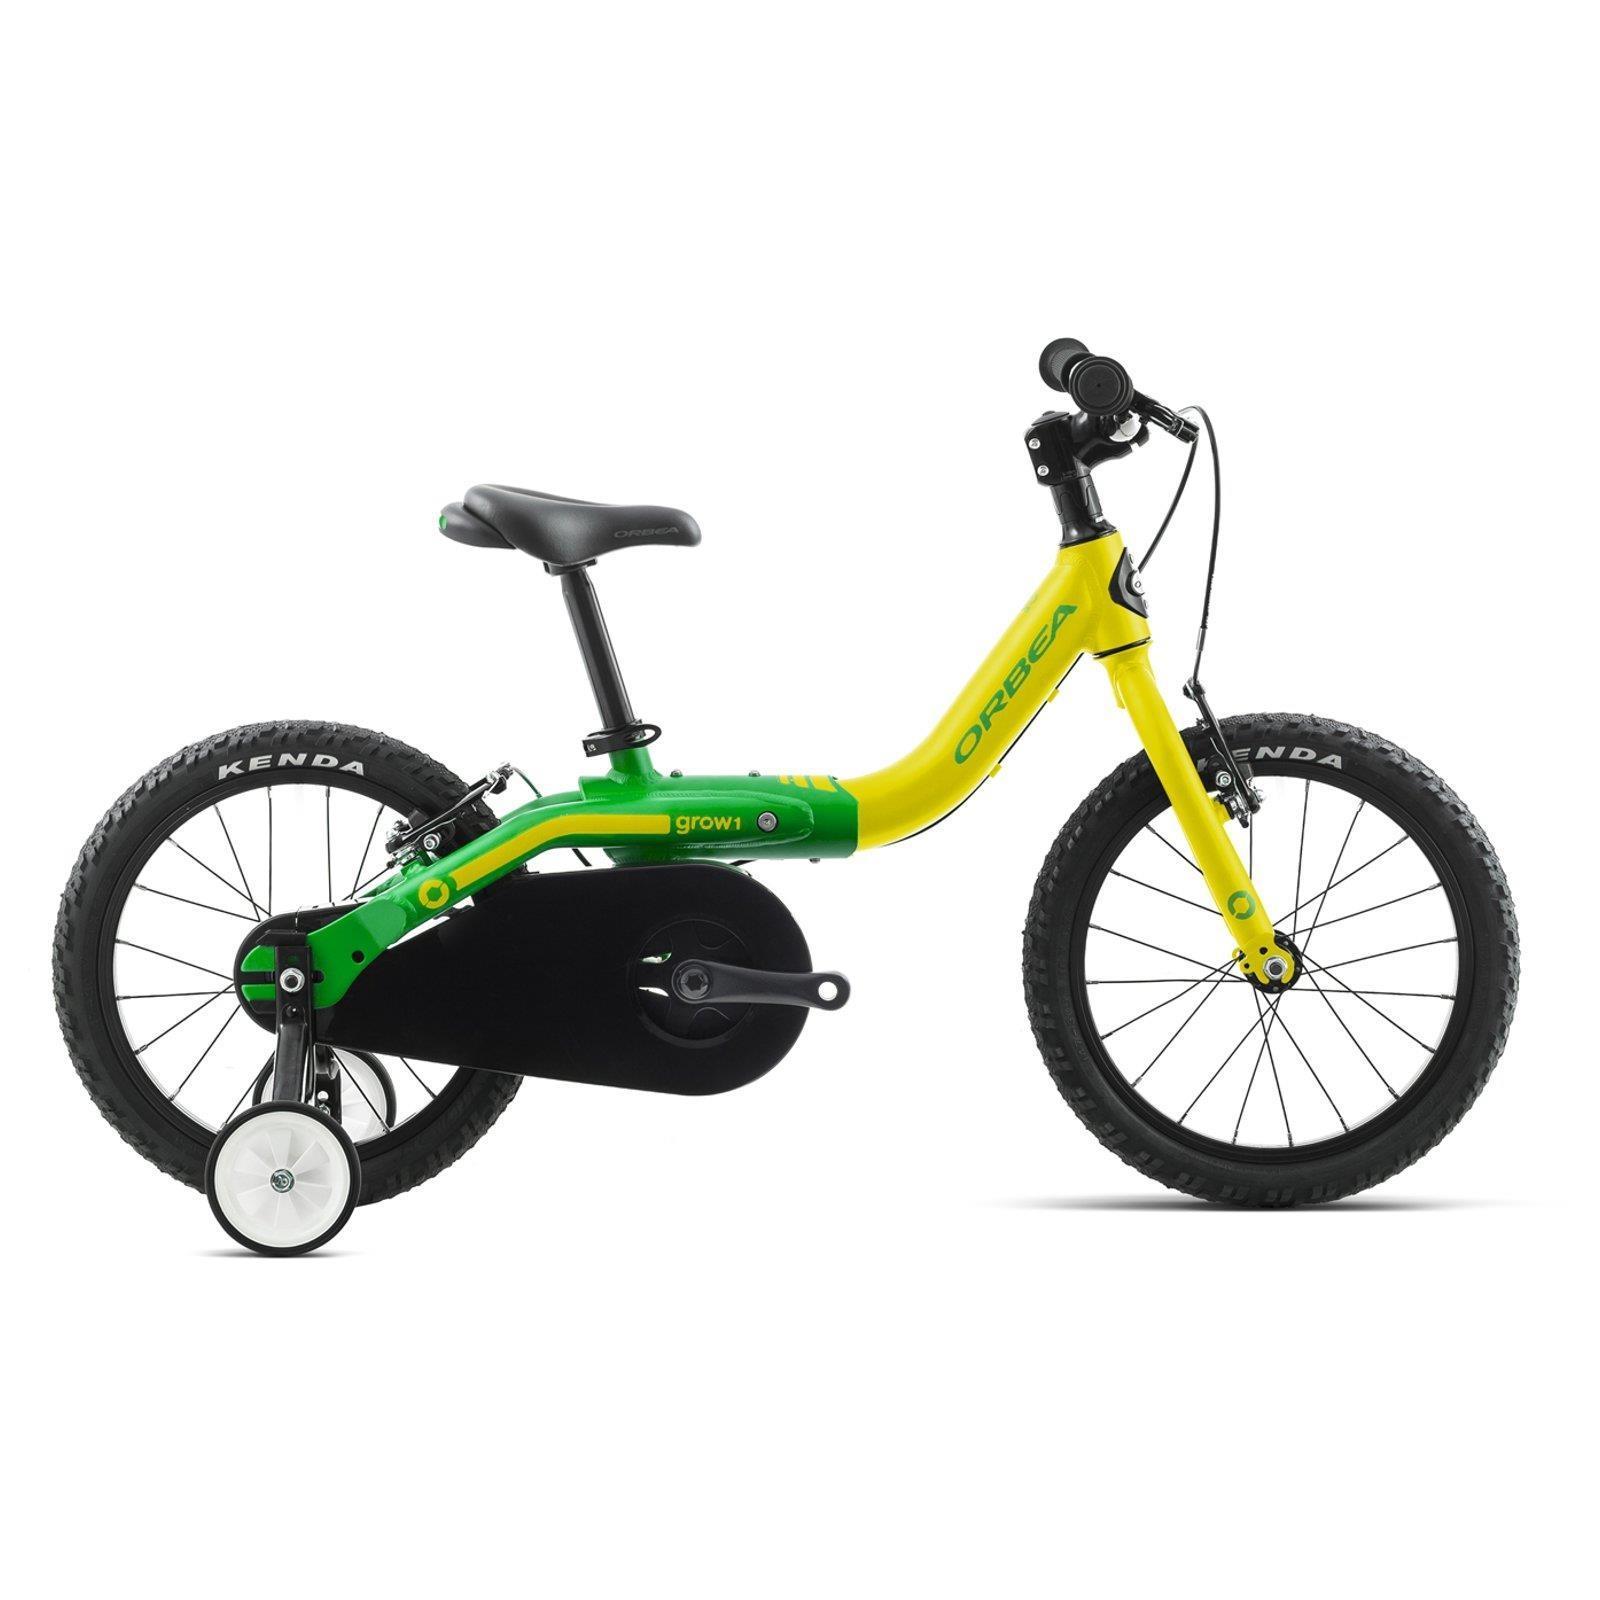 orbea grow 1 kinder fahrrad 16 zoll bike 1 gang aluminium. Black Bedroom Furniture Sets. Home Design Ideas